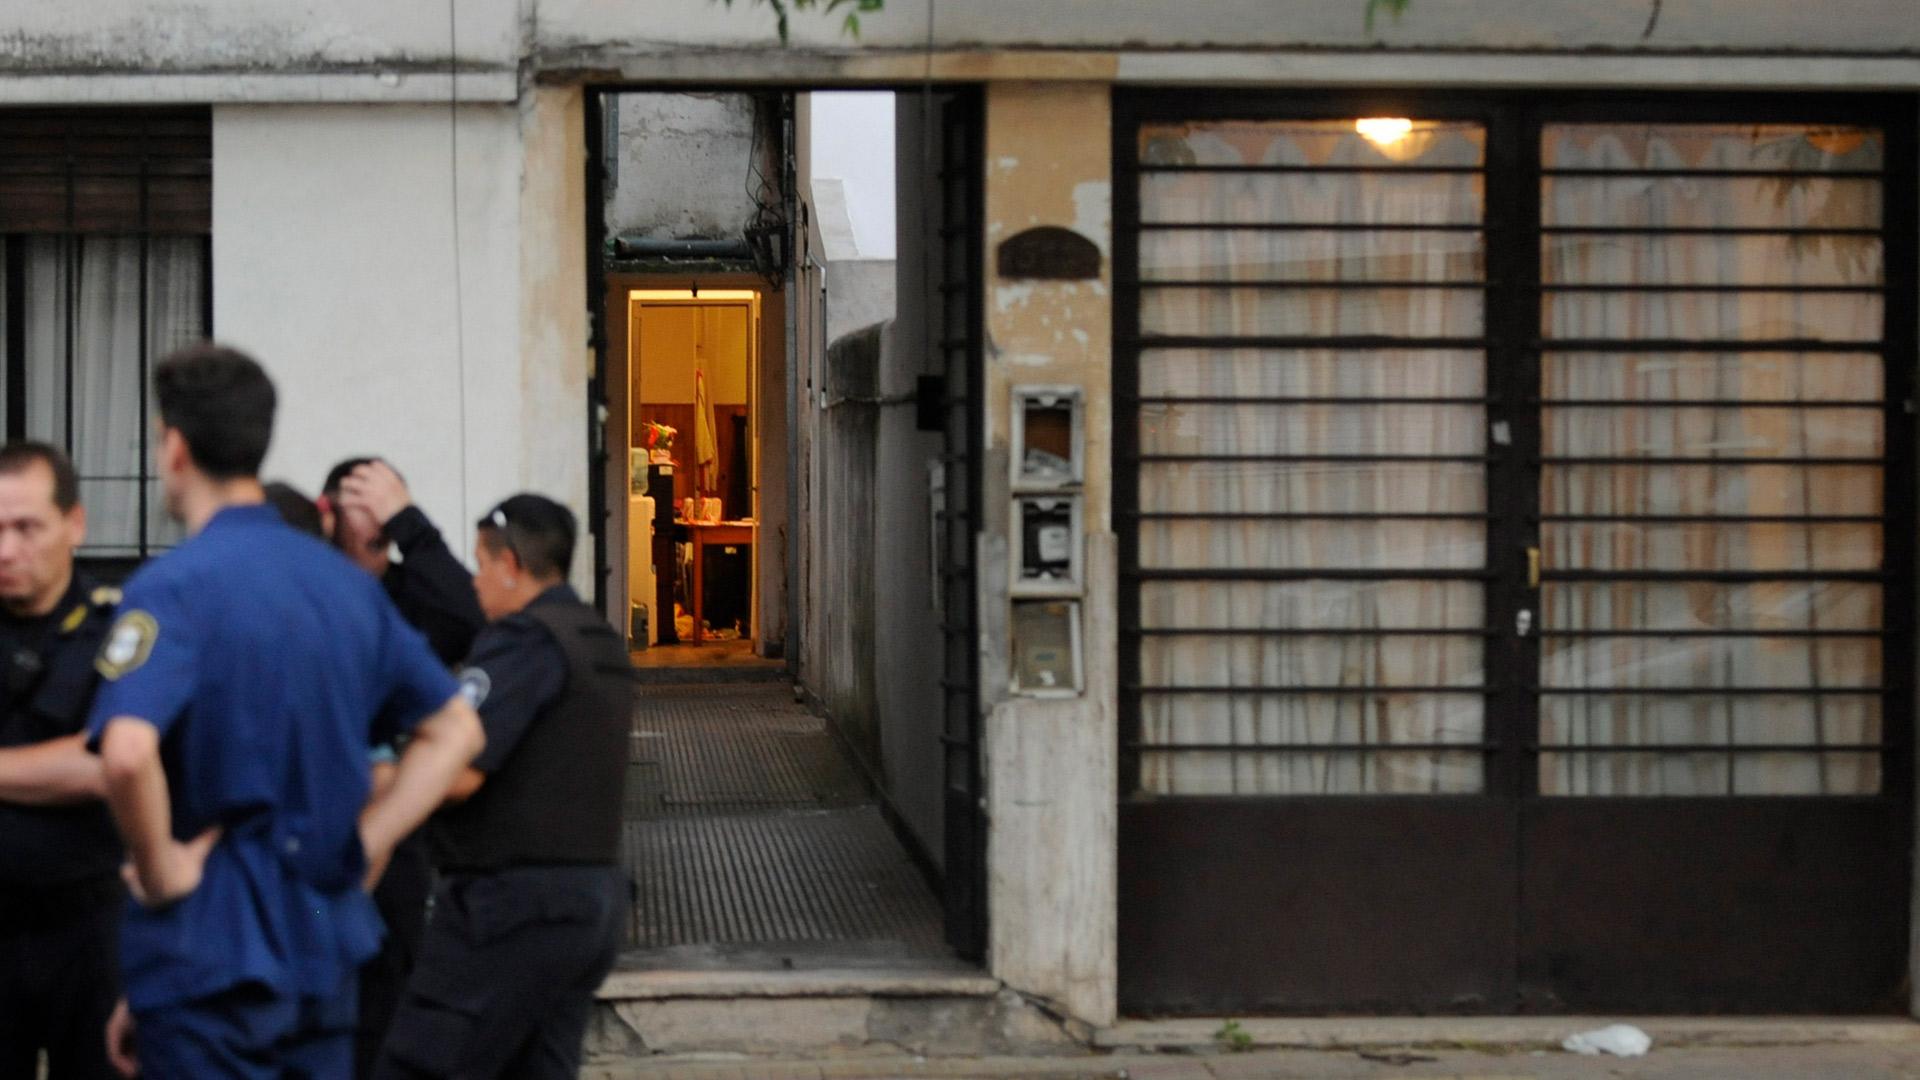 Fachada de la vivienda de la víctima (Fotos: Dino Calvo)